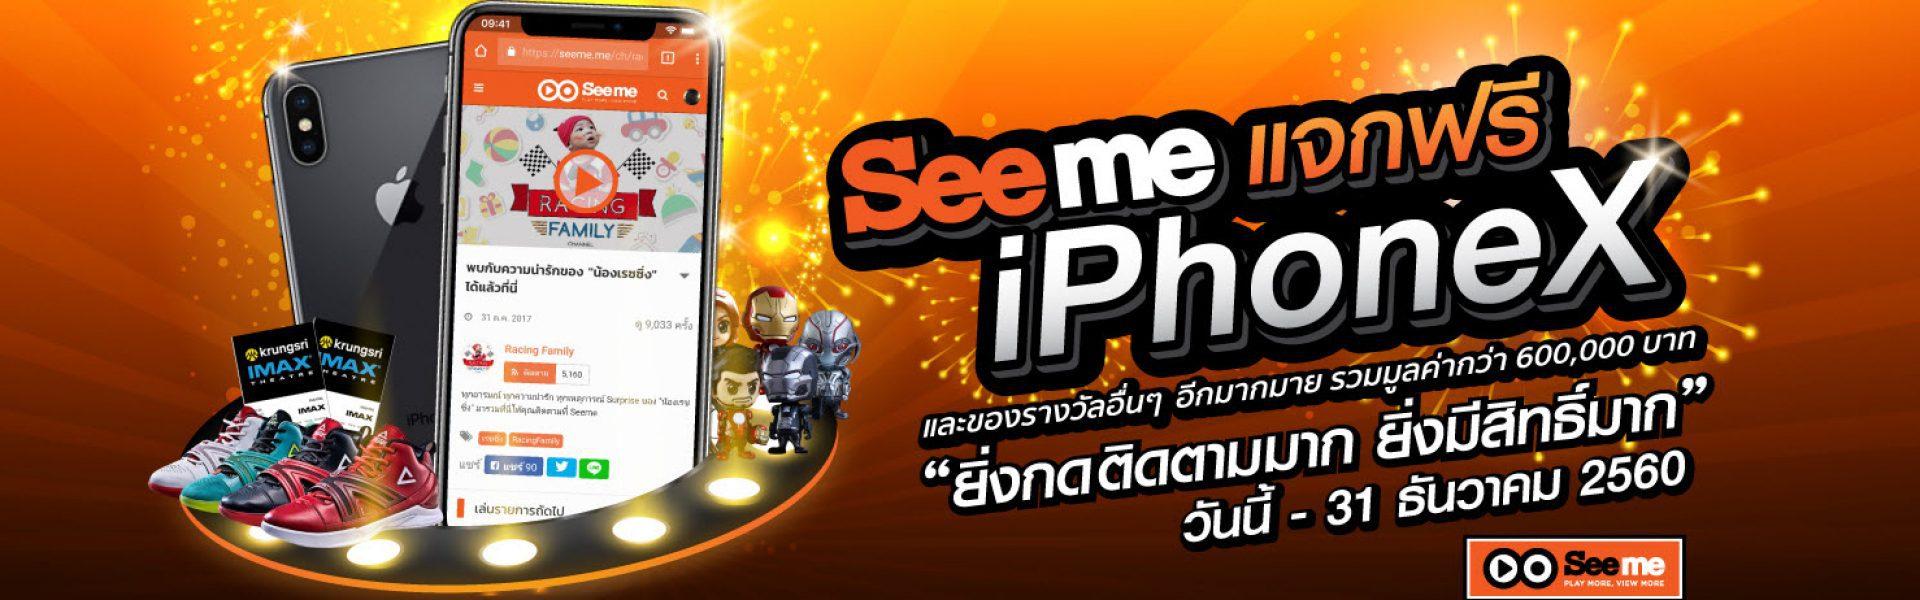 """Seeme แจกฟรี iPhone X"" ง่ายๆแค่เข้าไปกดติดตาม Channel ใดก็ได้ของ seeme.me"